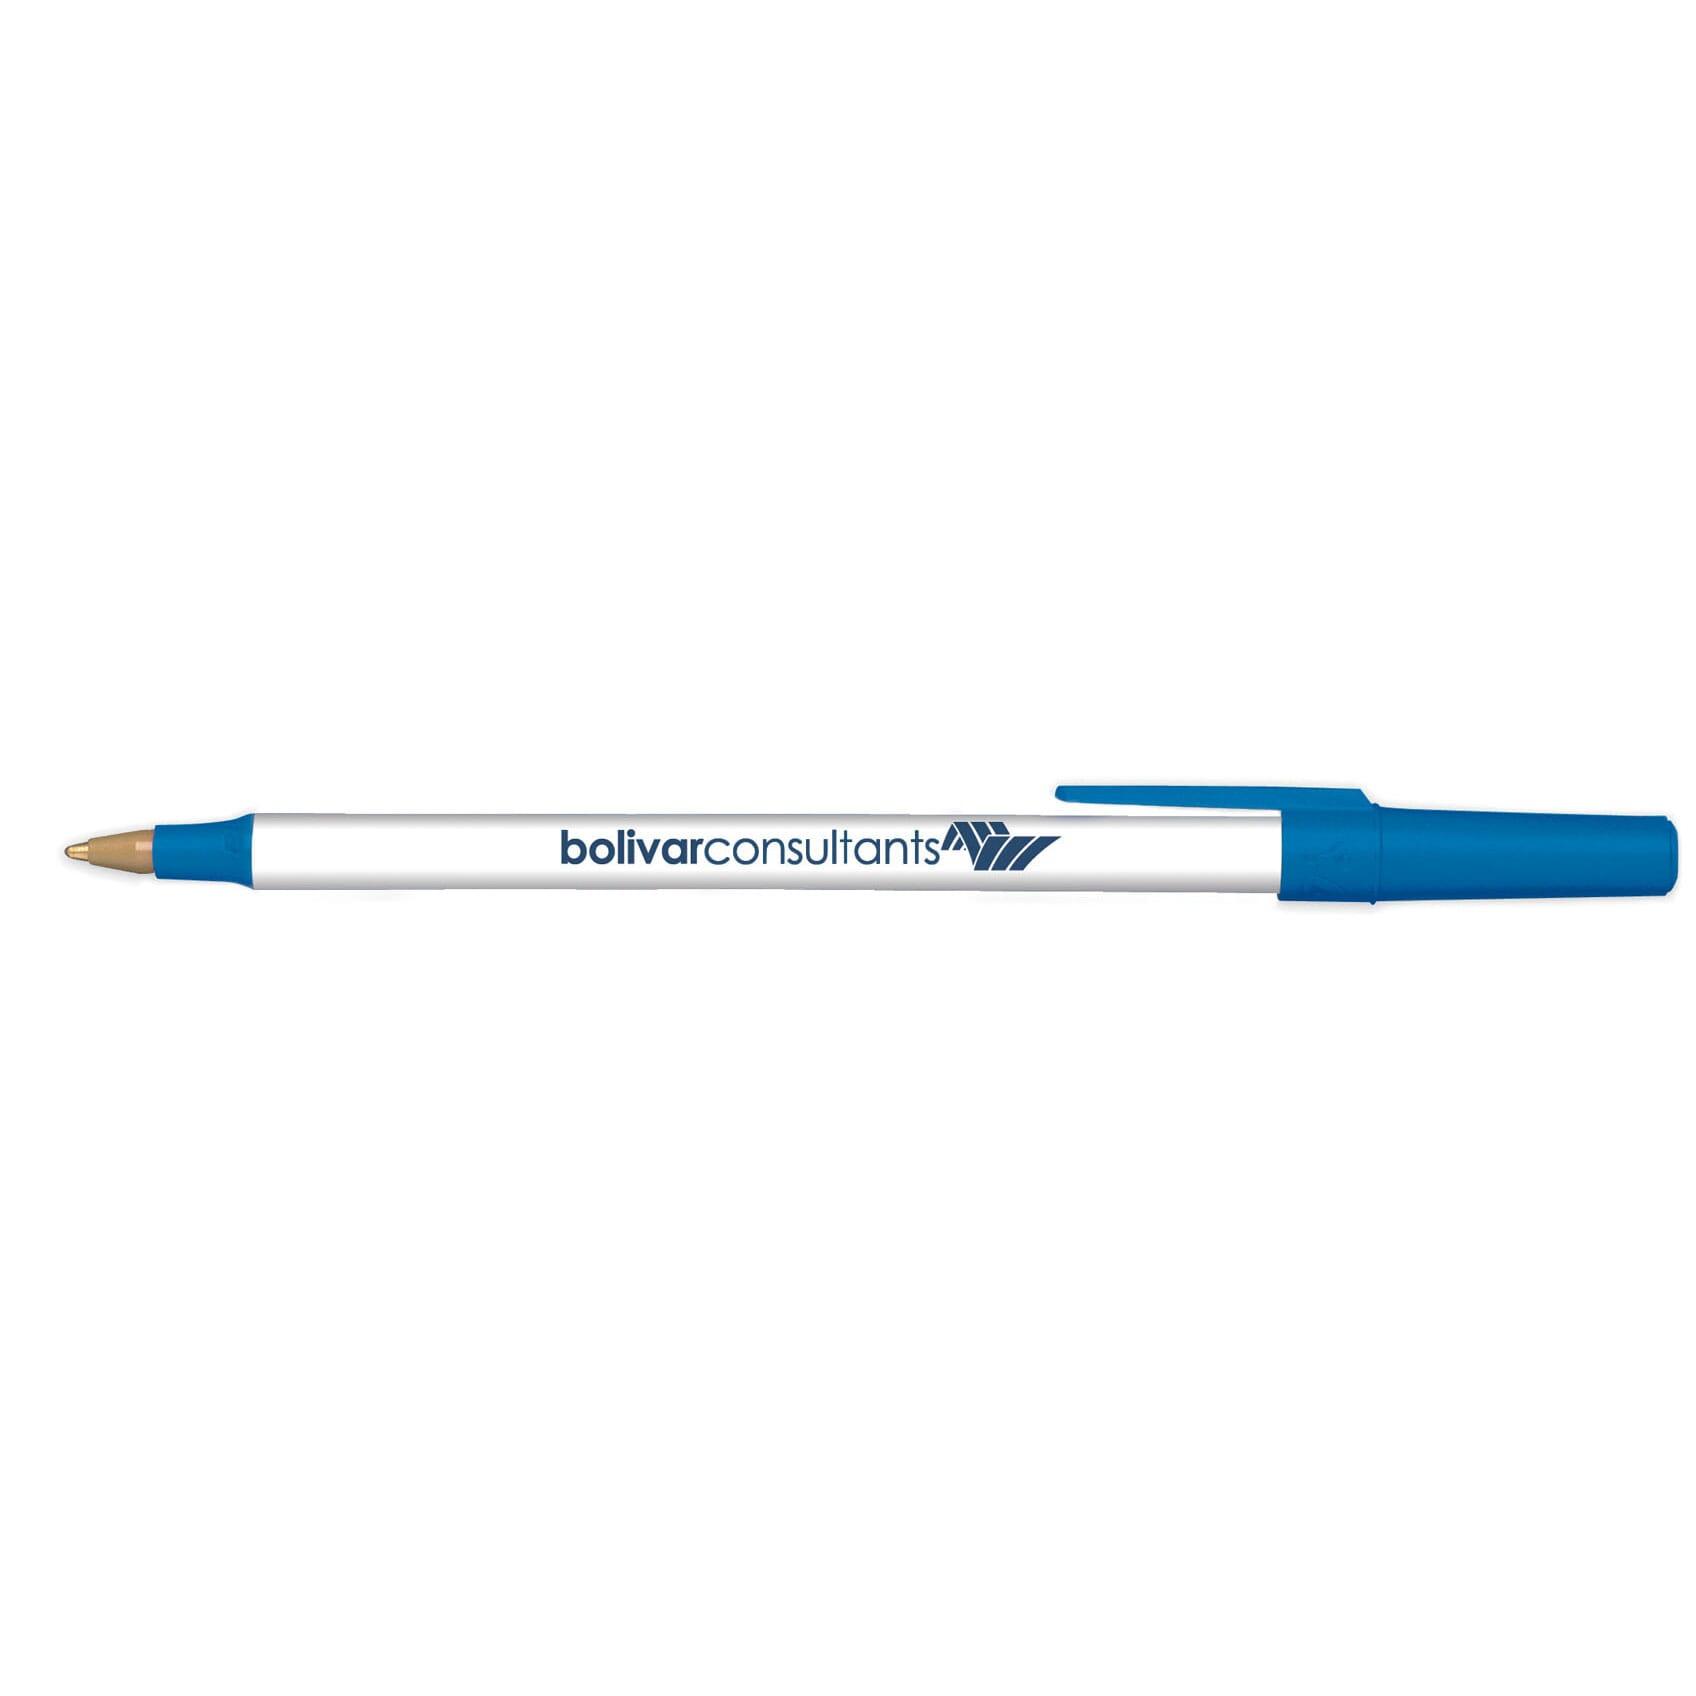 Antimicrobial Bic pen